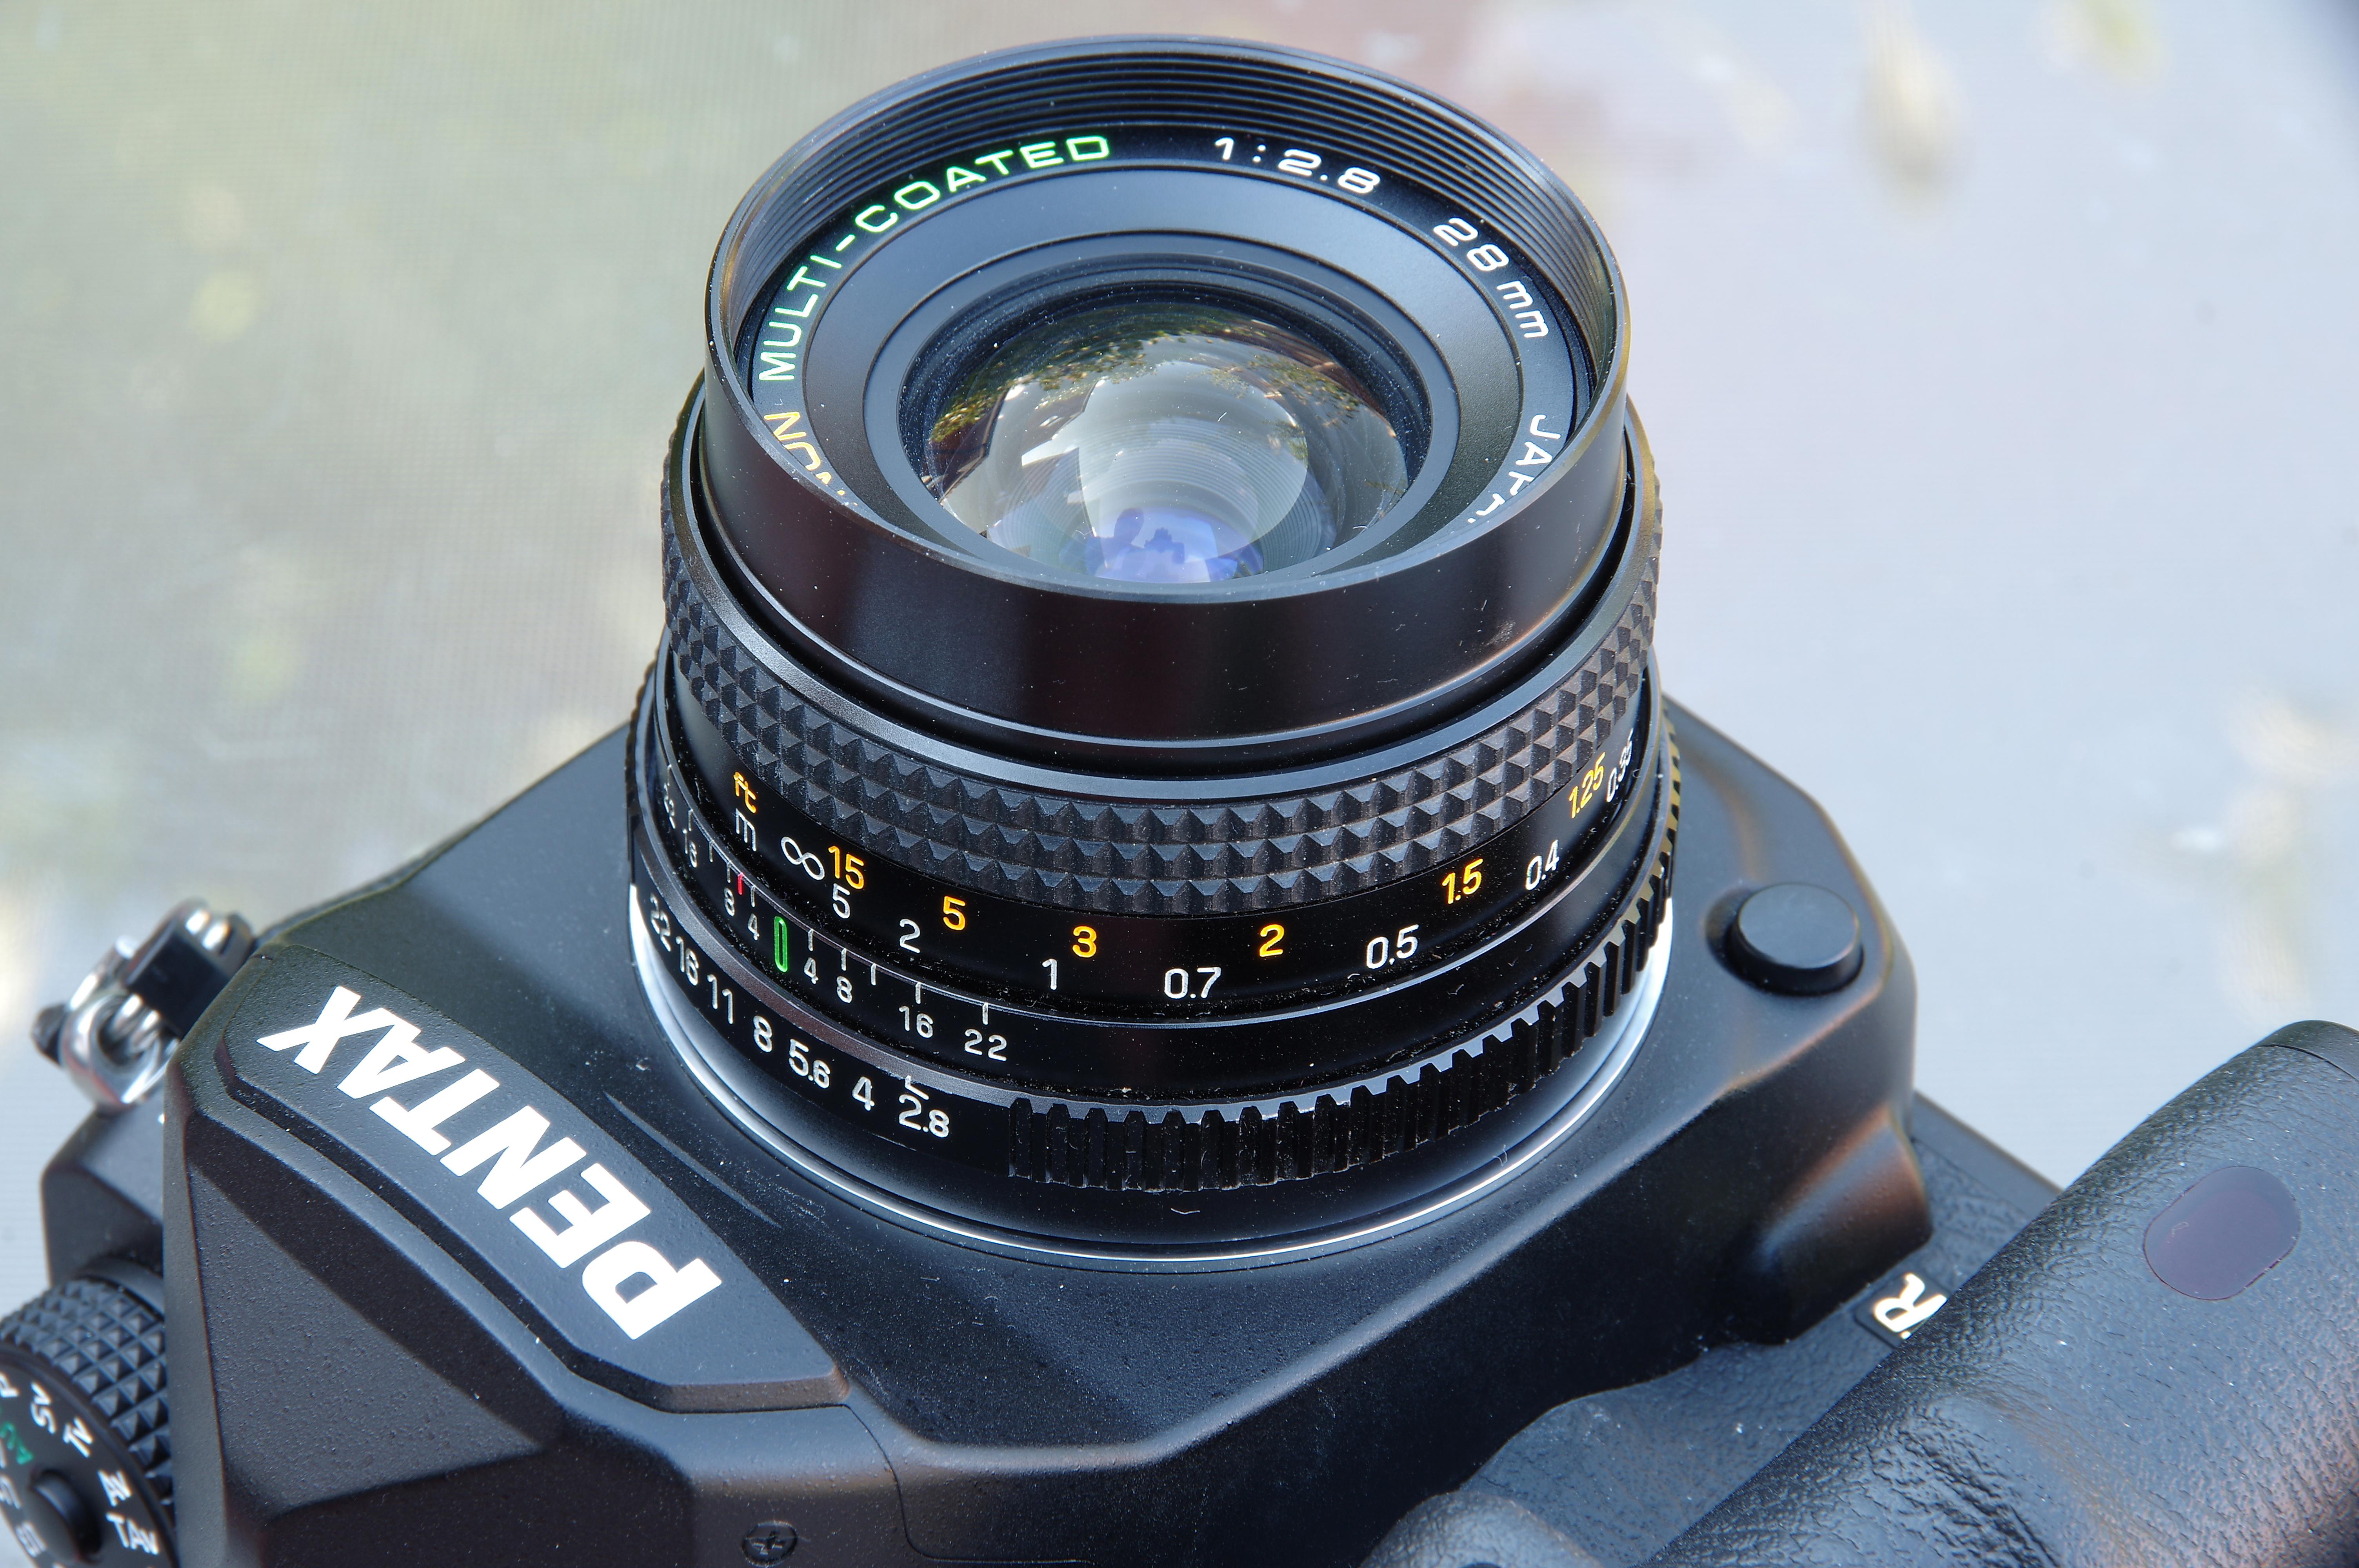 Auto Chinon Multi-coated 28mm f/2 8 Vintage Lens Review | ePHOTOzine